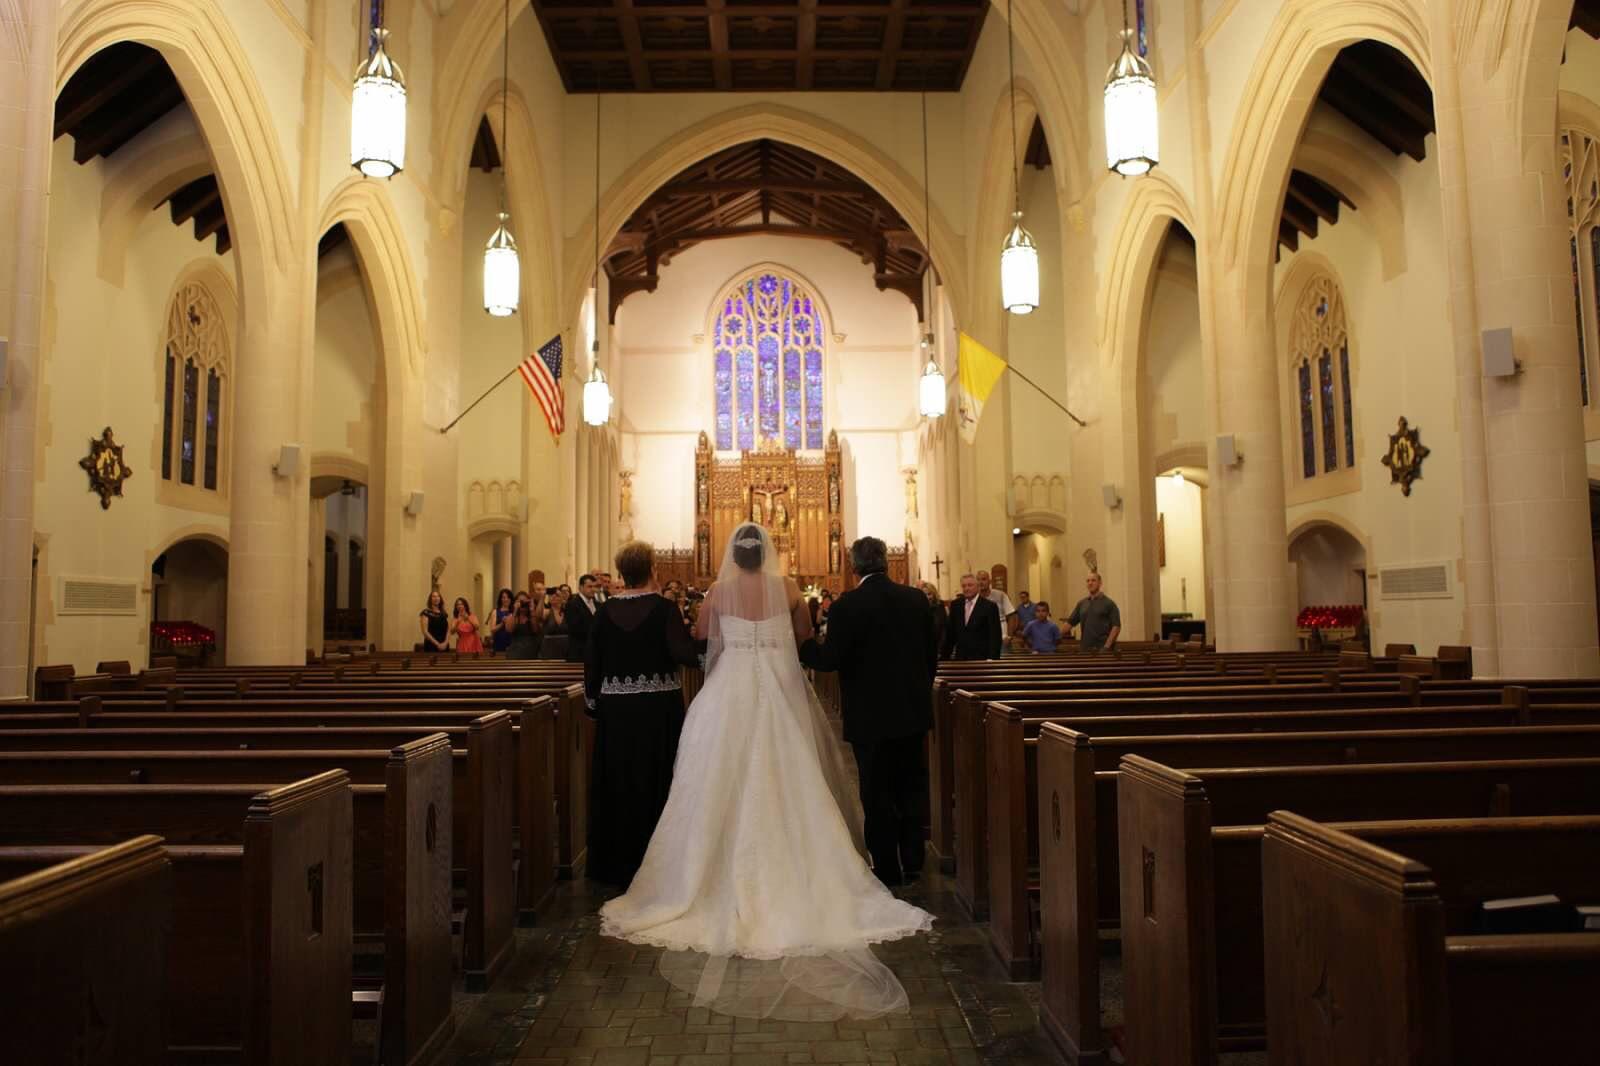 Danielle Caprese (Kleinfeld) lace wedding dress with